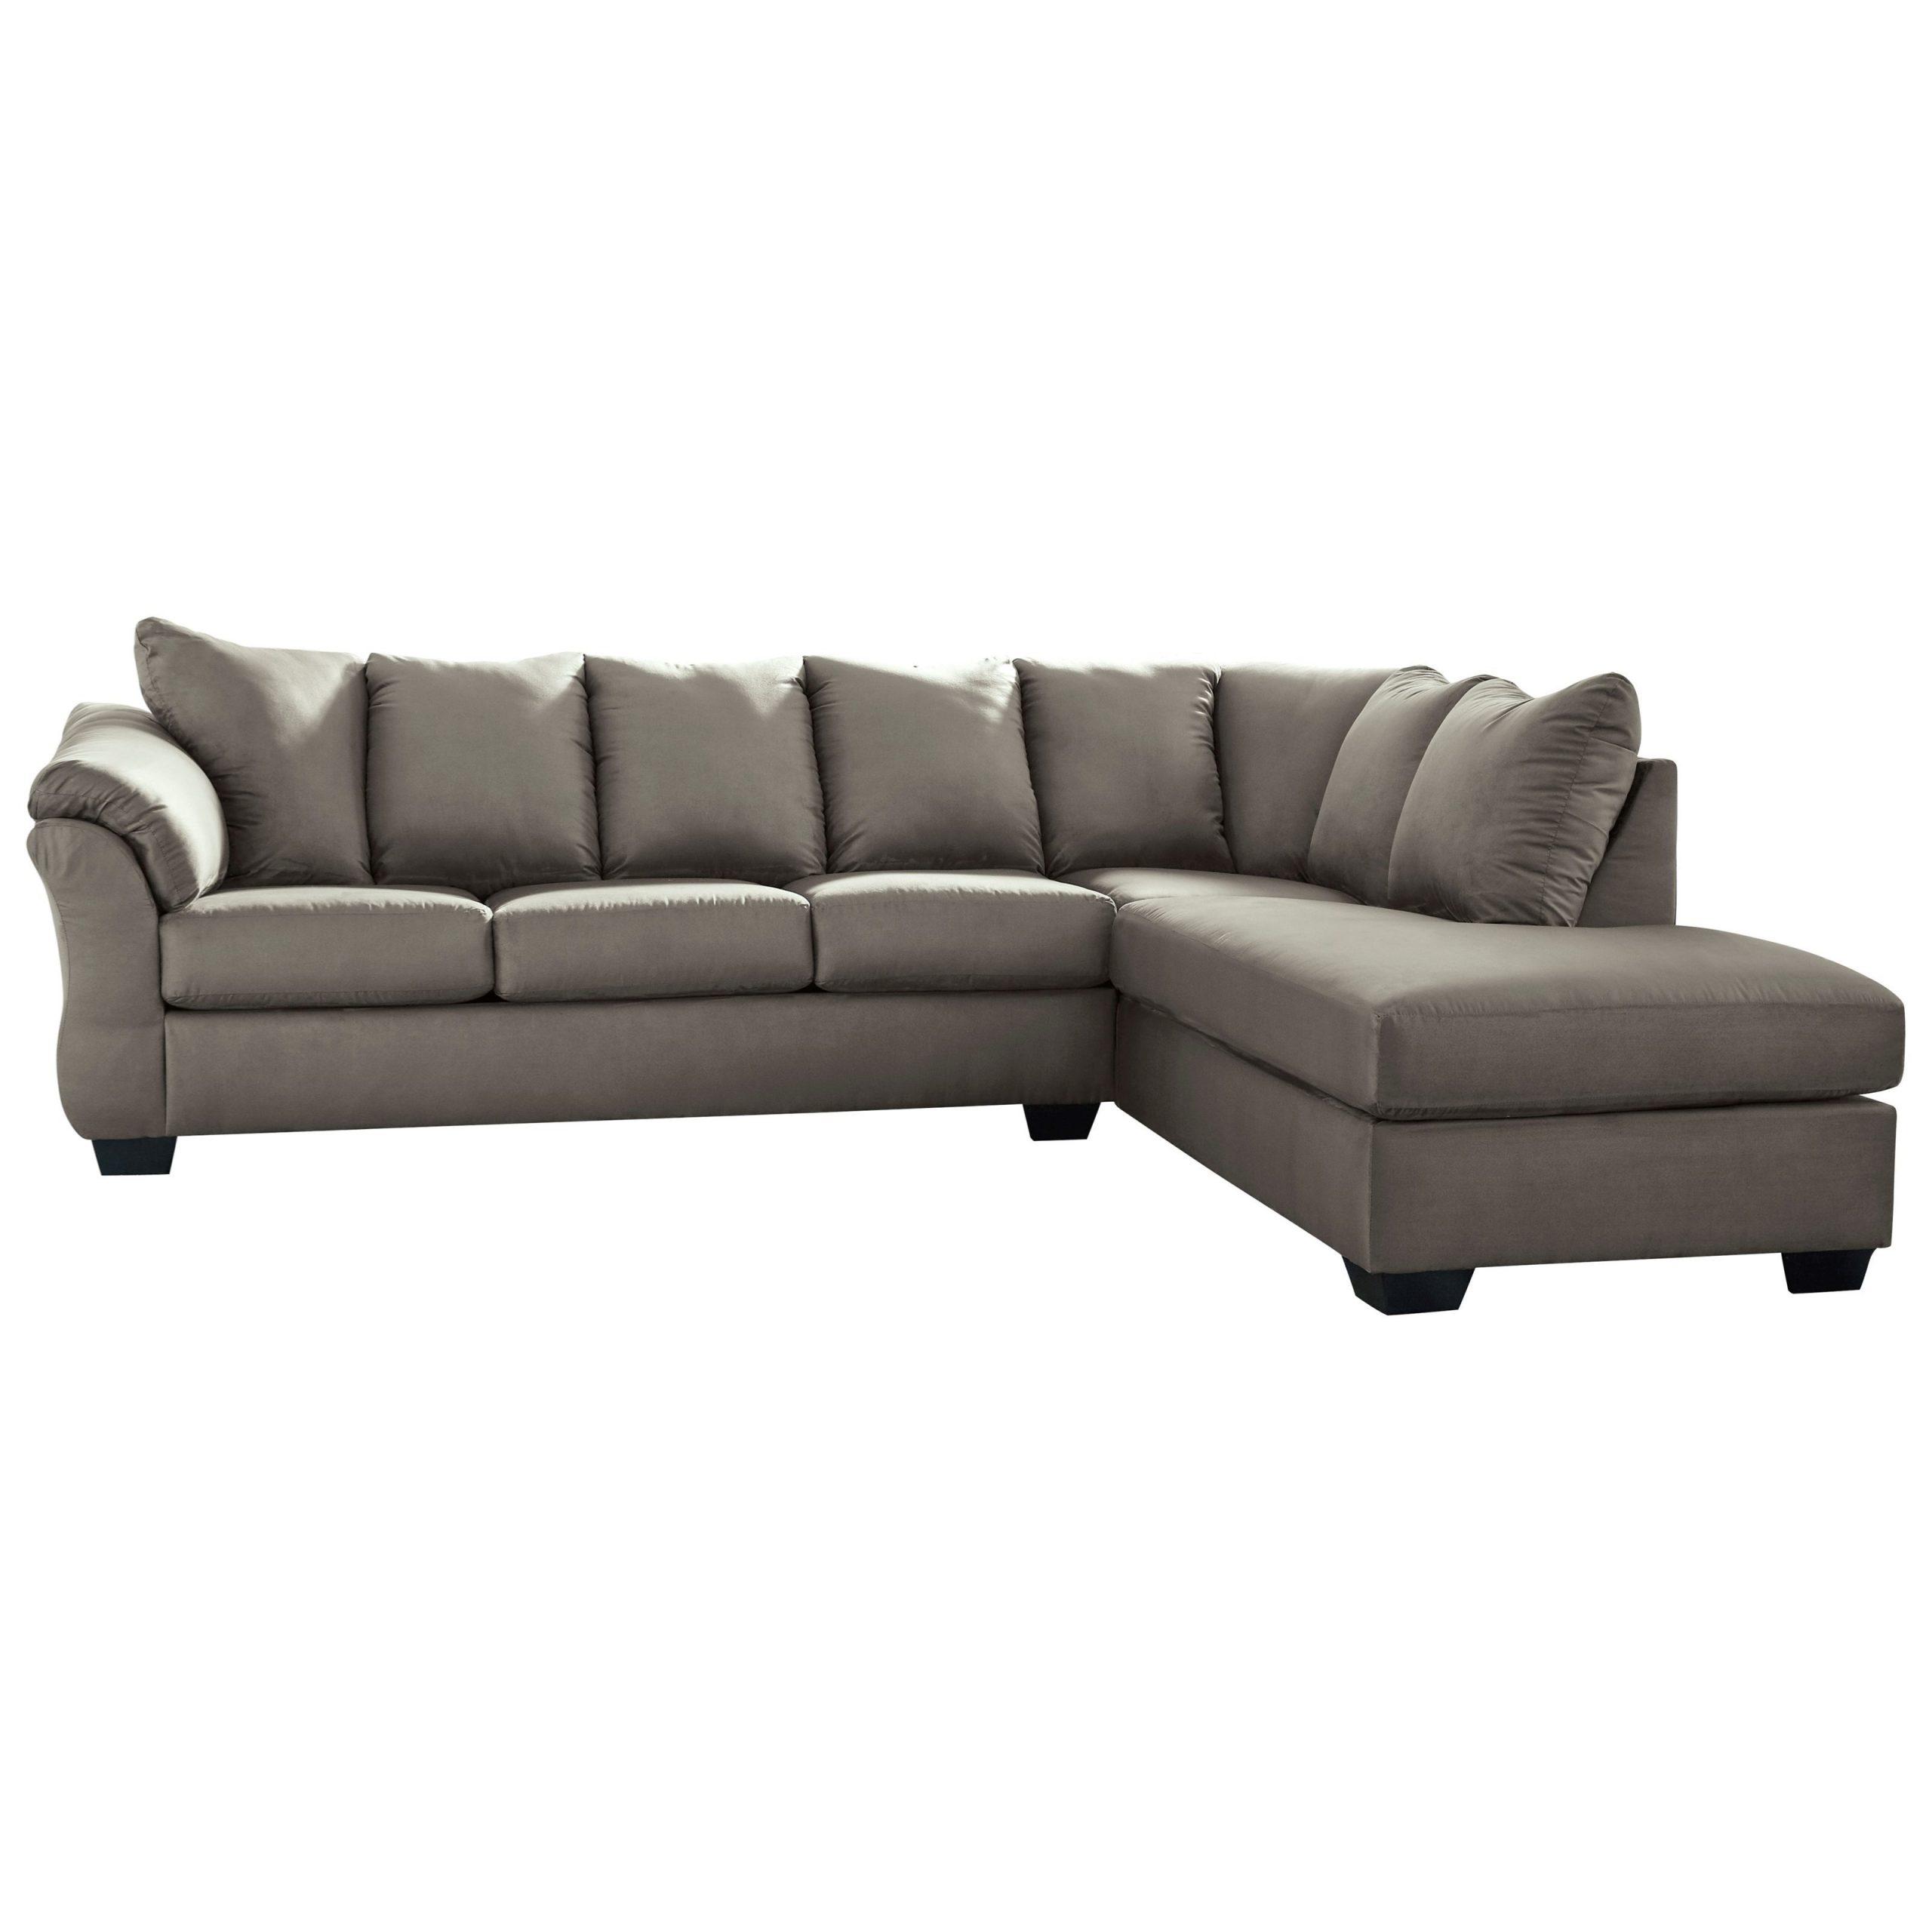 Newest 2Pc Burland Contemporary Chaise Sectional Sofas Regarding Signature Designashley Darcy – Cobblestone (View 18 of 25)